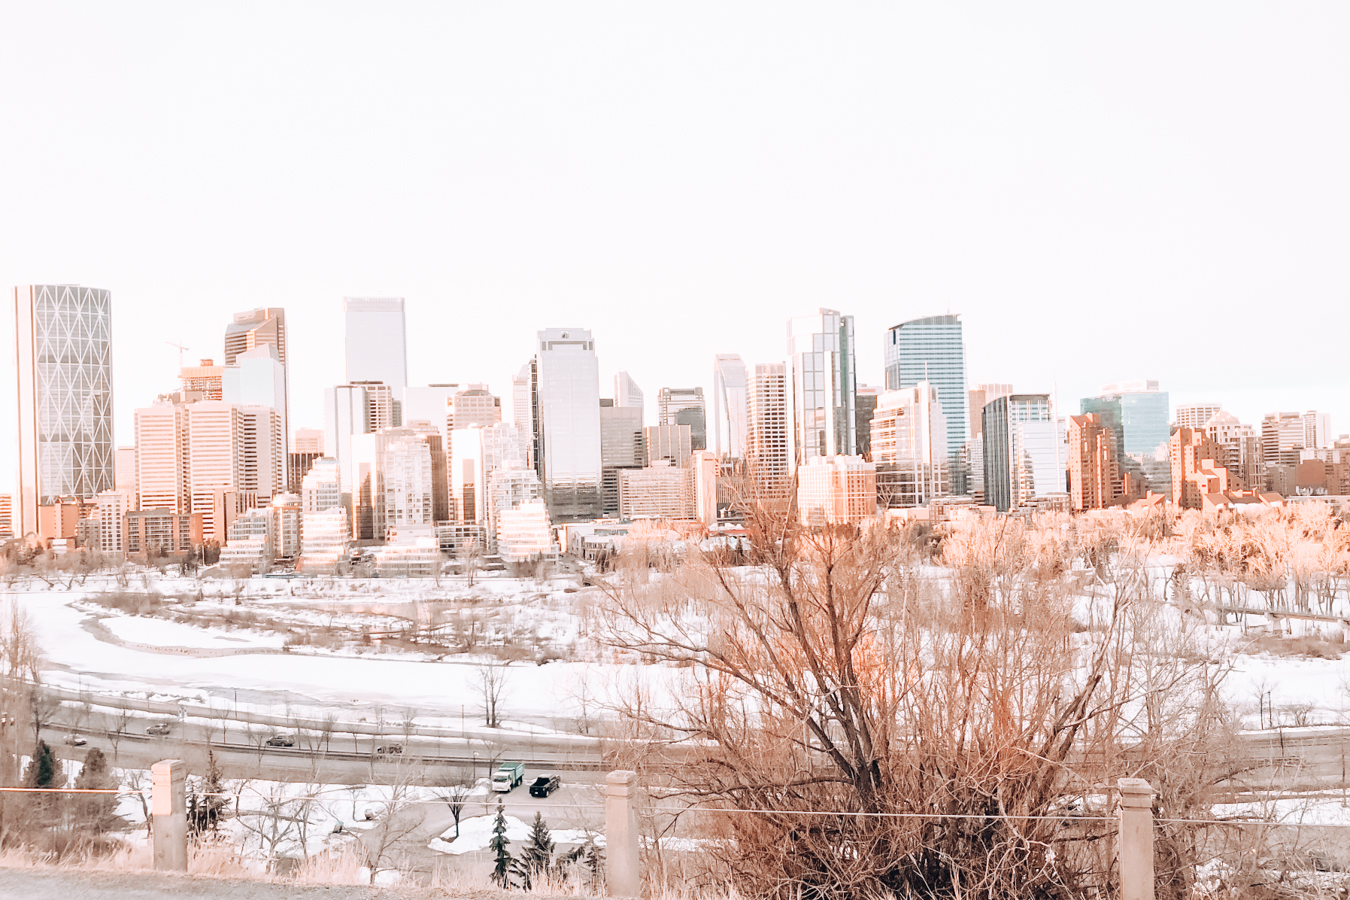 A view of Calgary